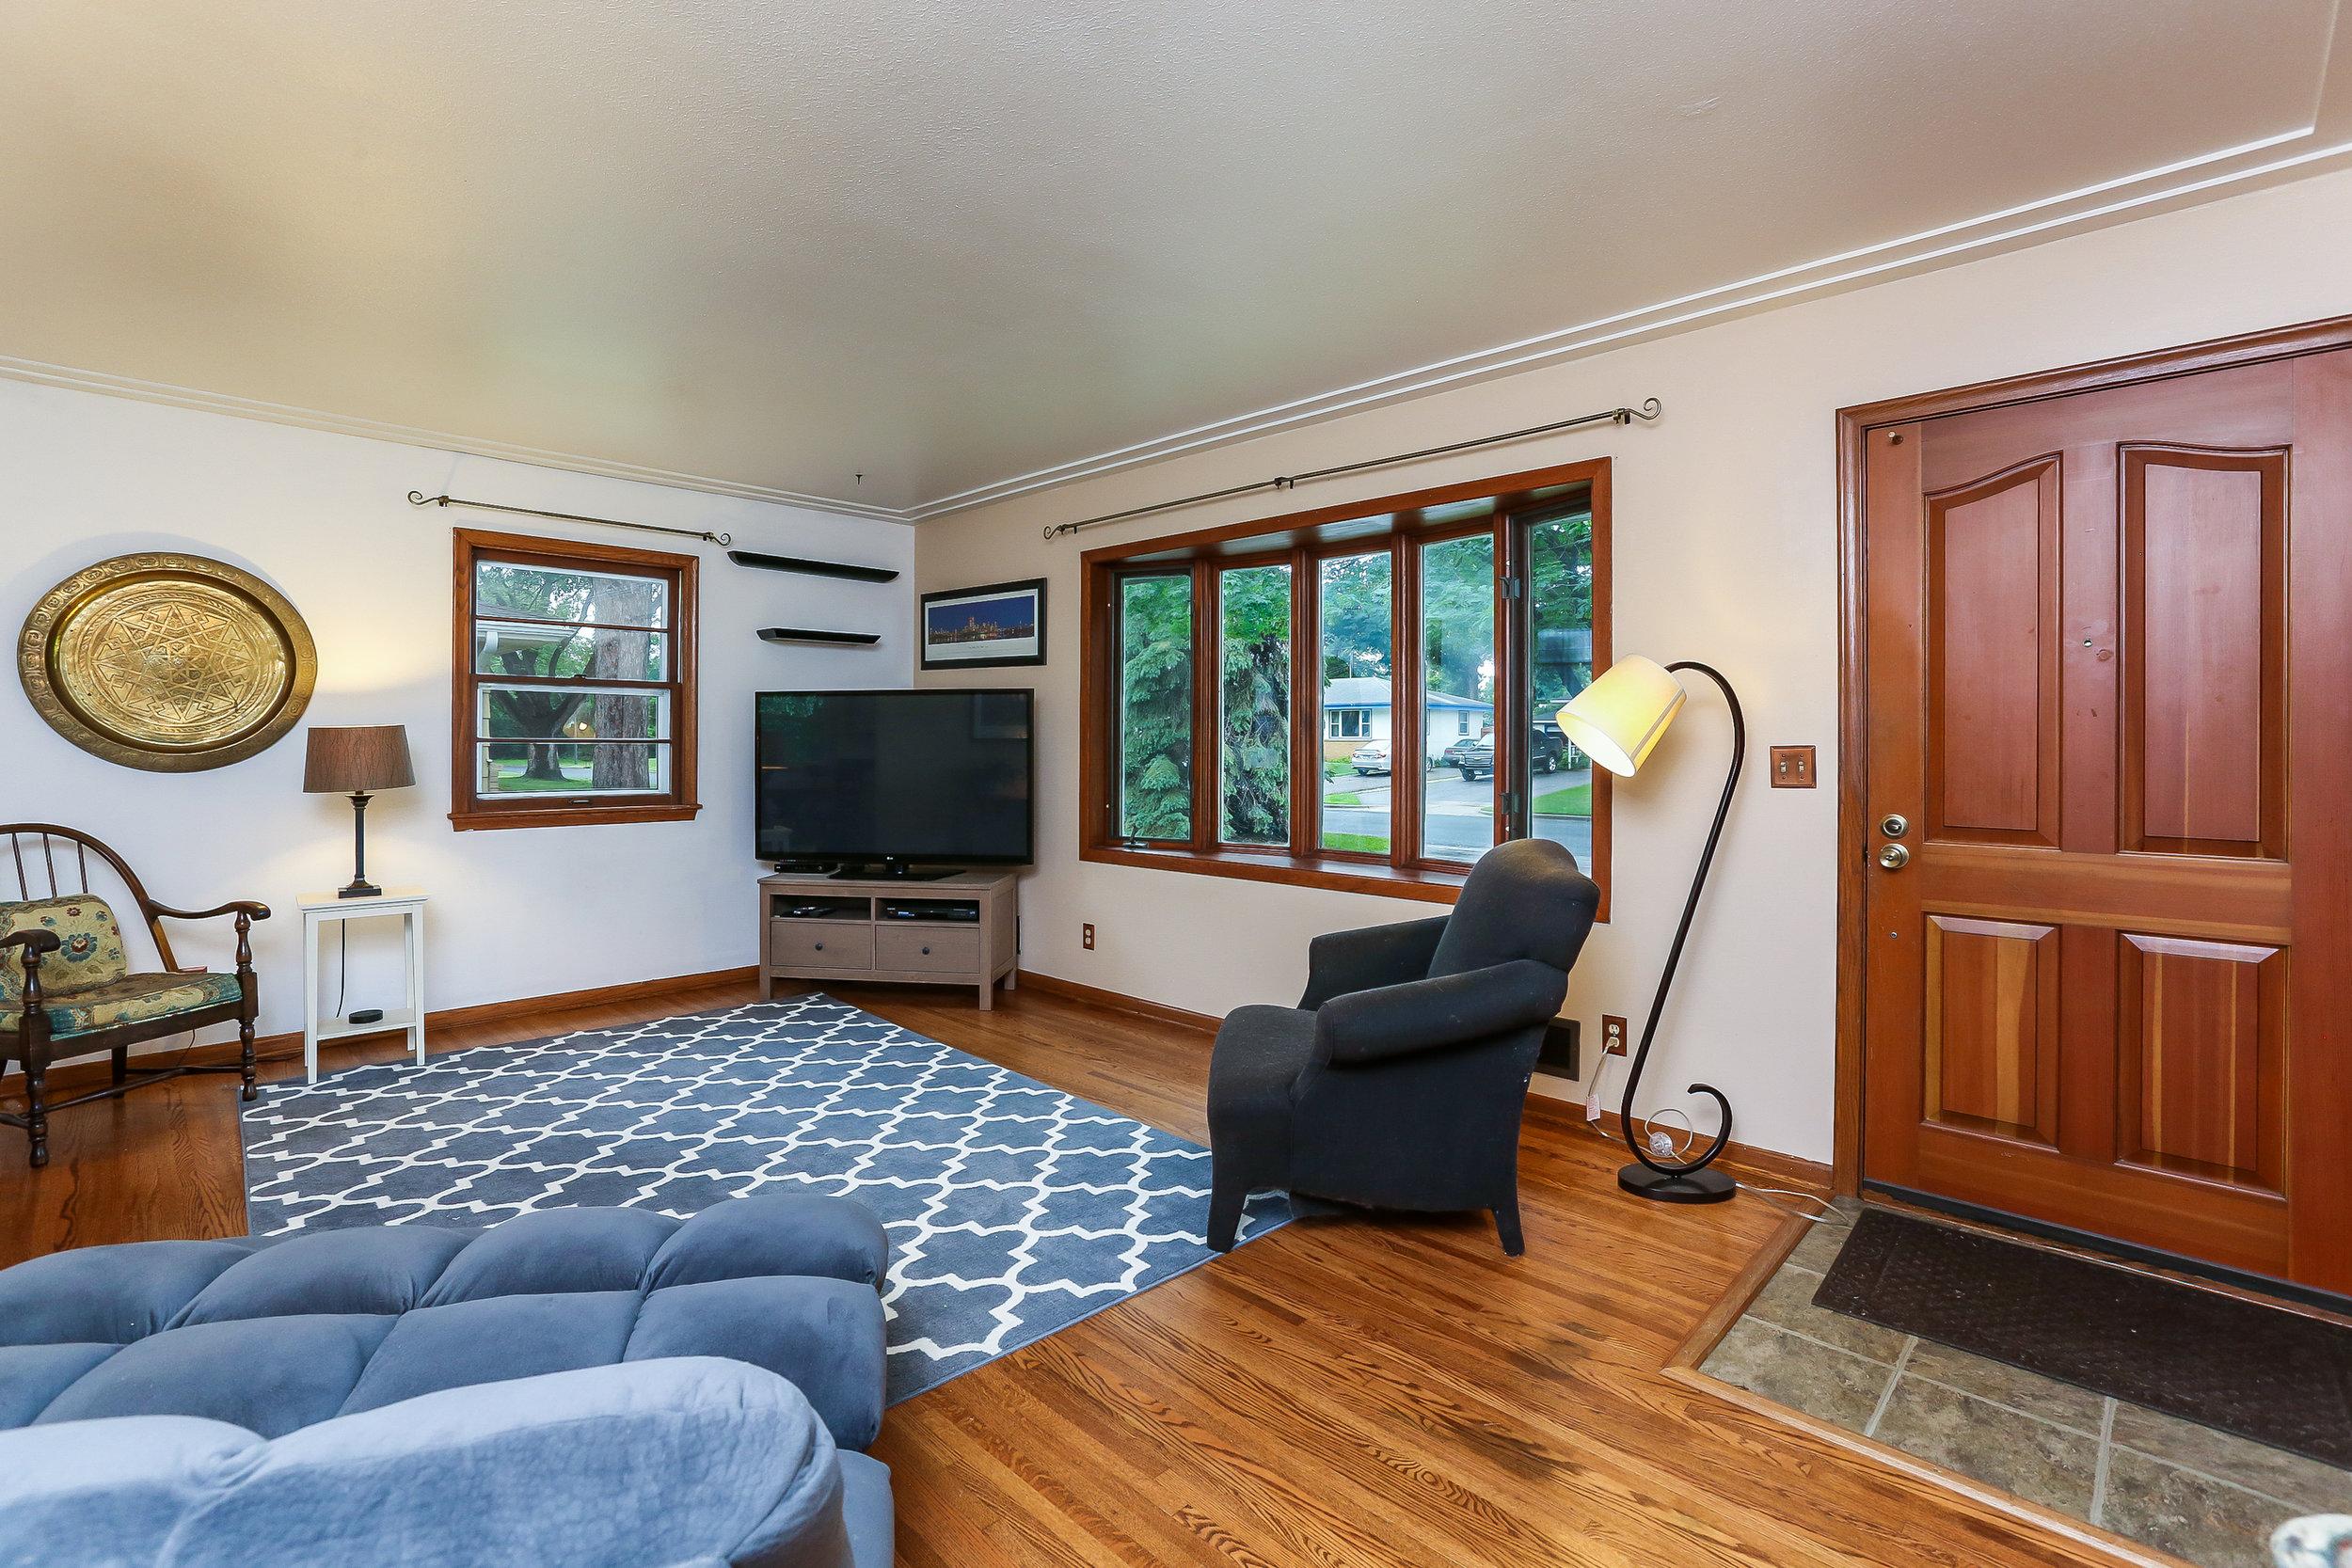 006-Living_Room-5916060-large.jpg